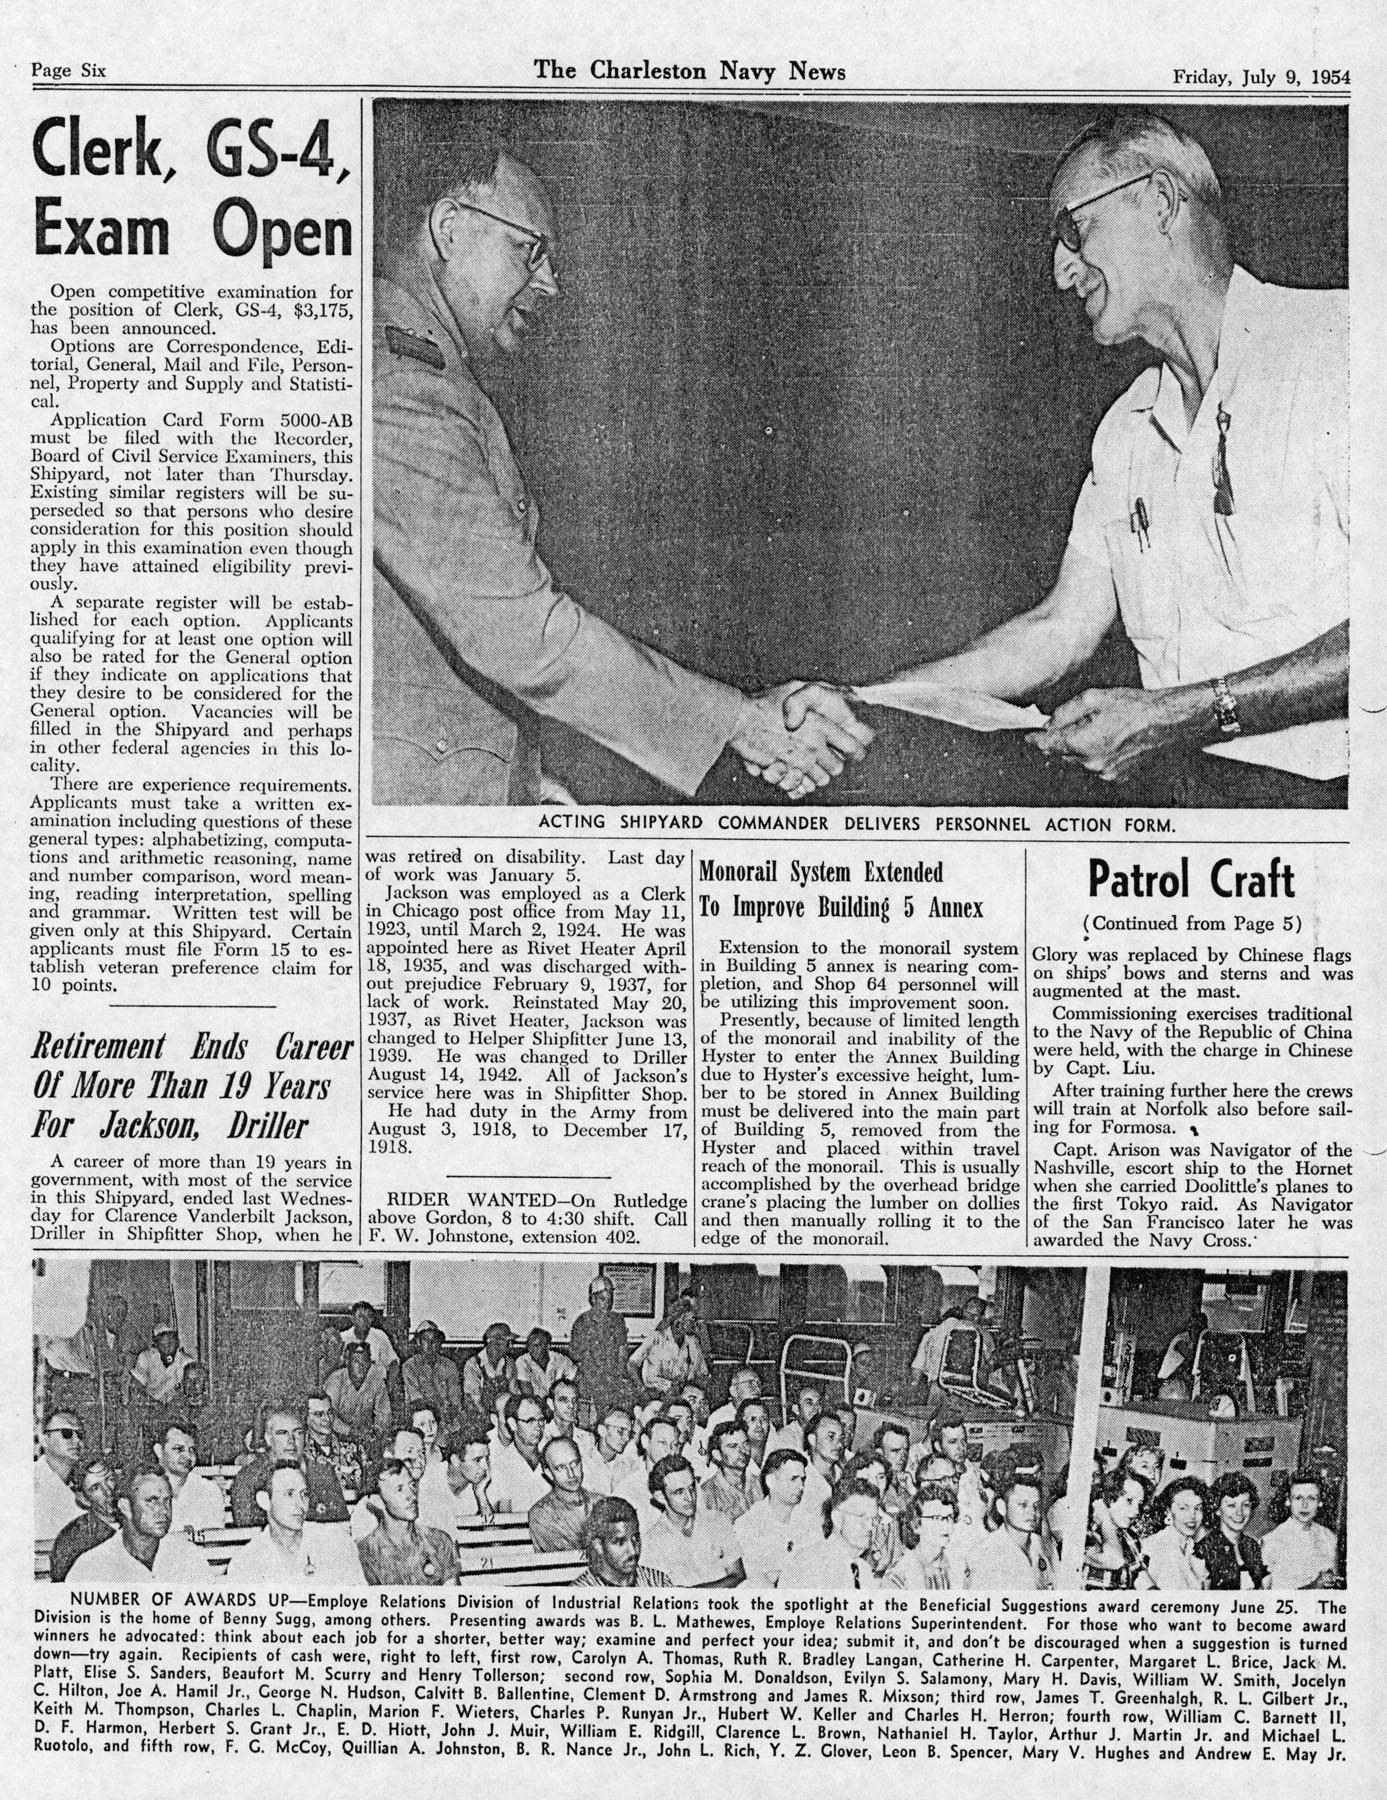 The Charleston Navy News, Volume 13, Edition 1, page vi